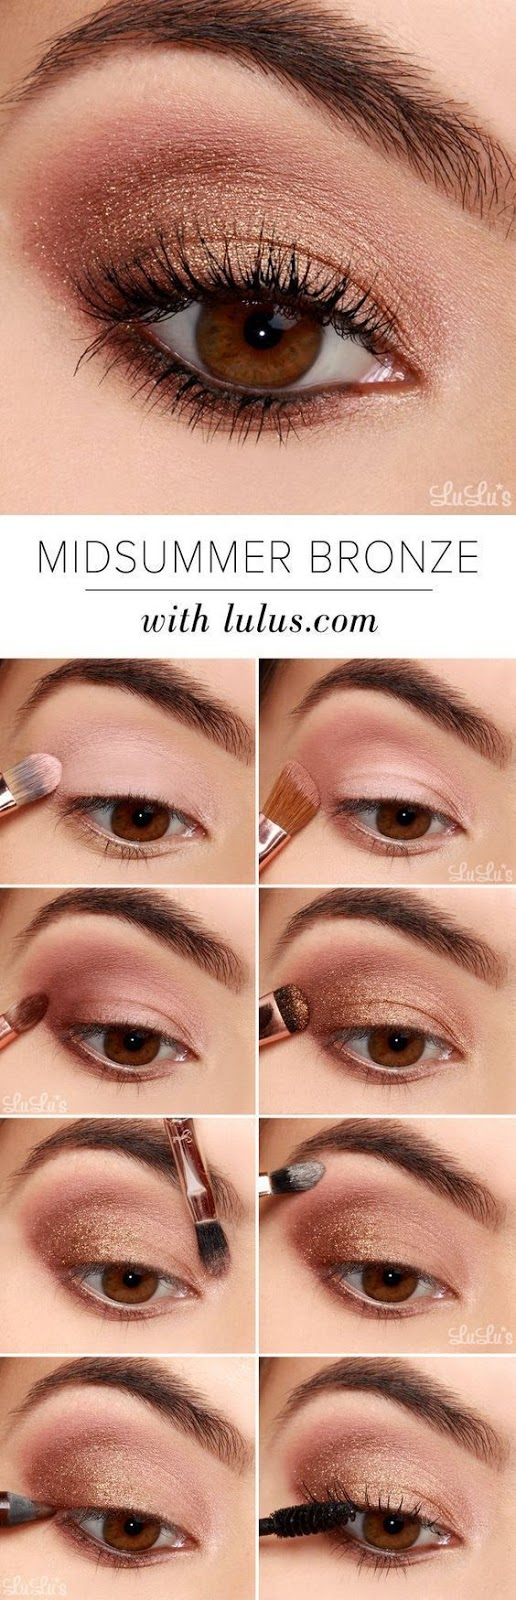 20 Easy Step By Step Eyeshadow Tutorials for Beginners